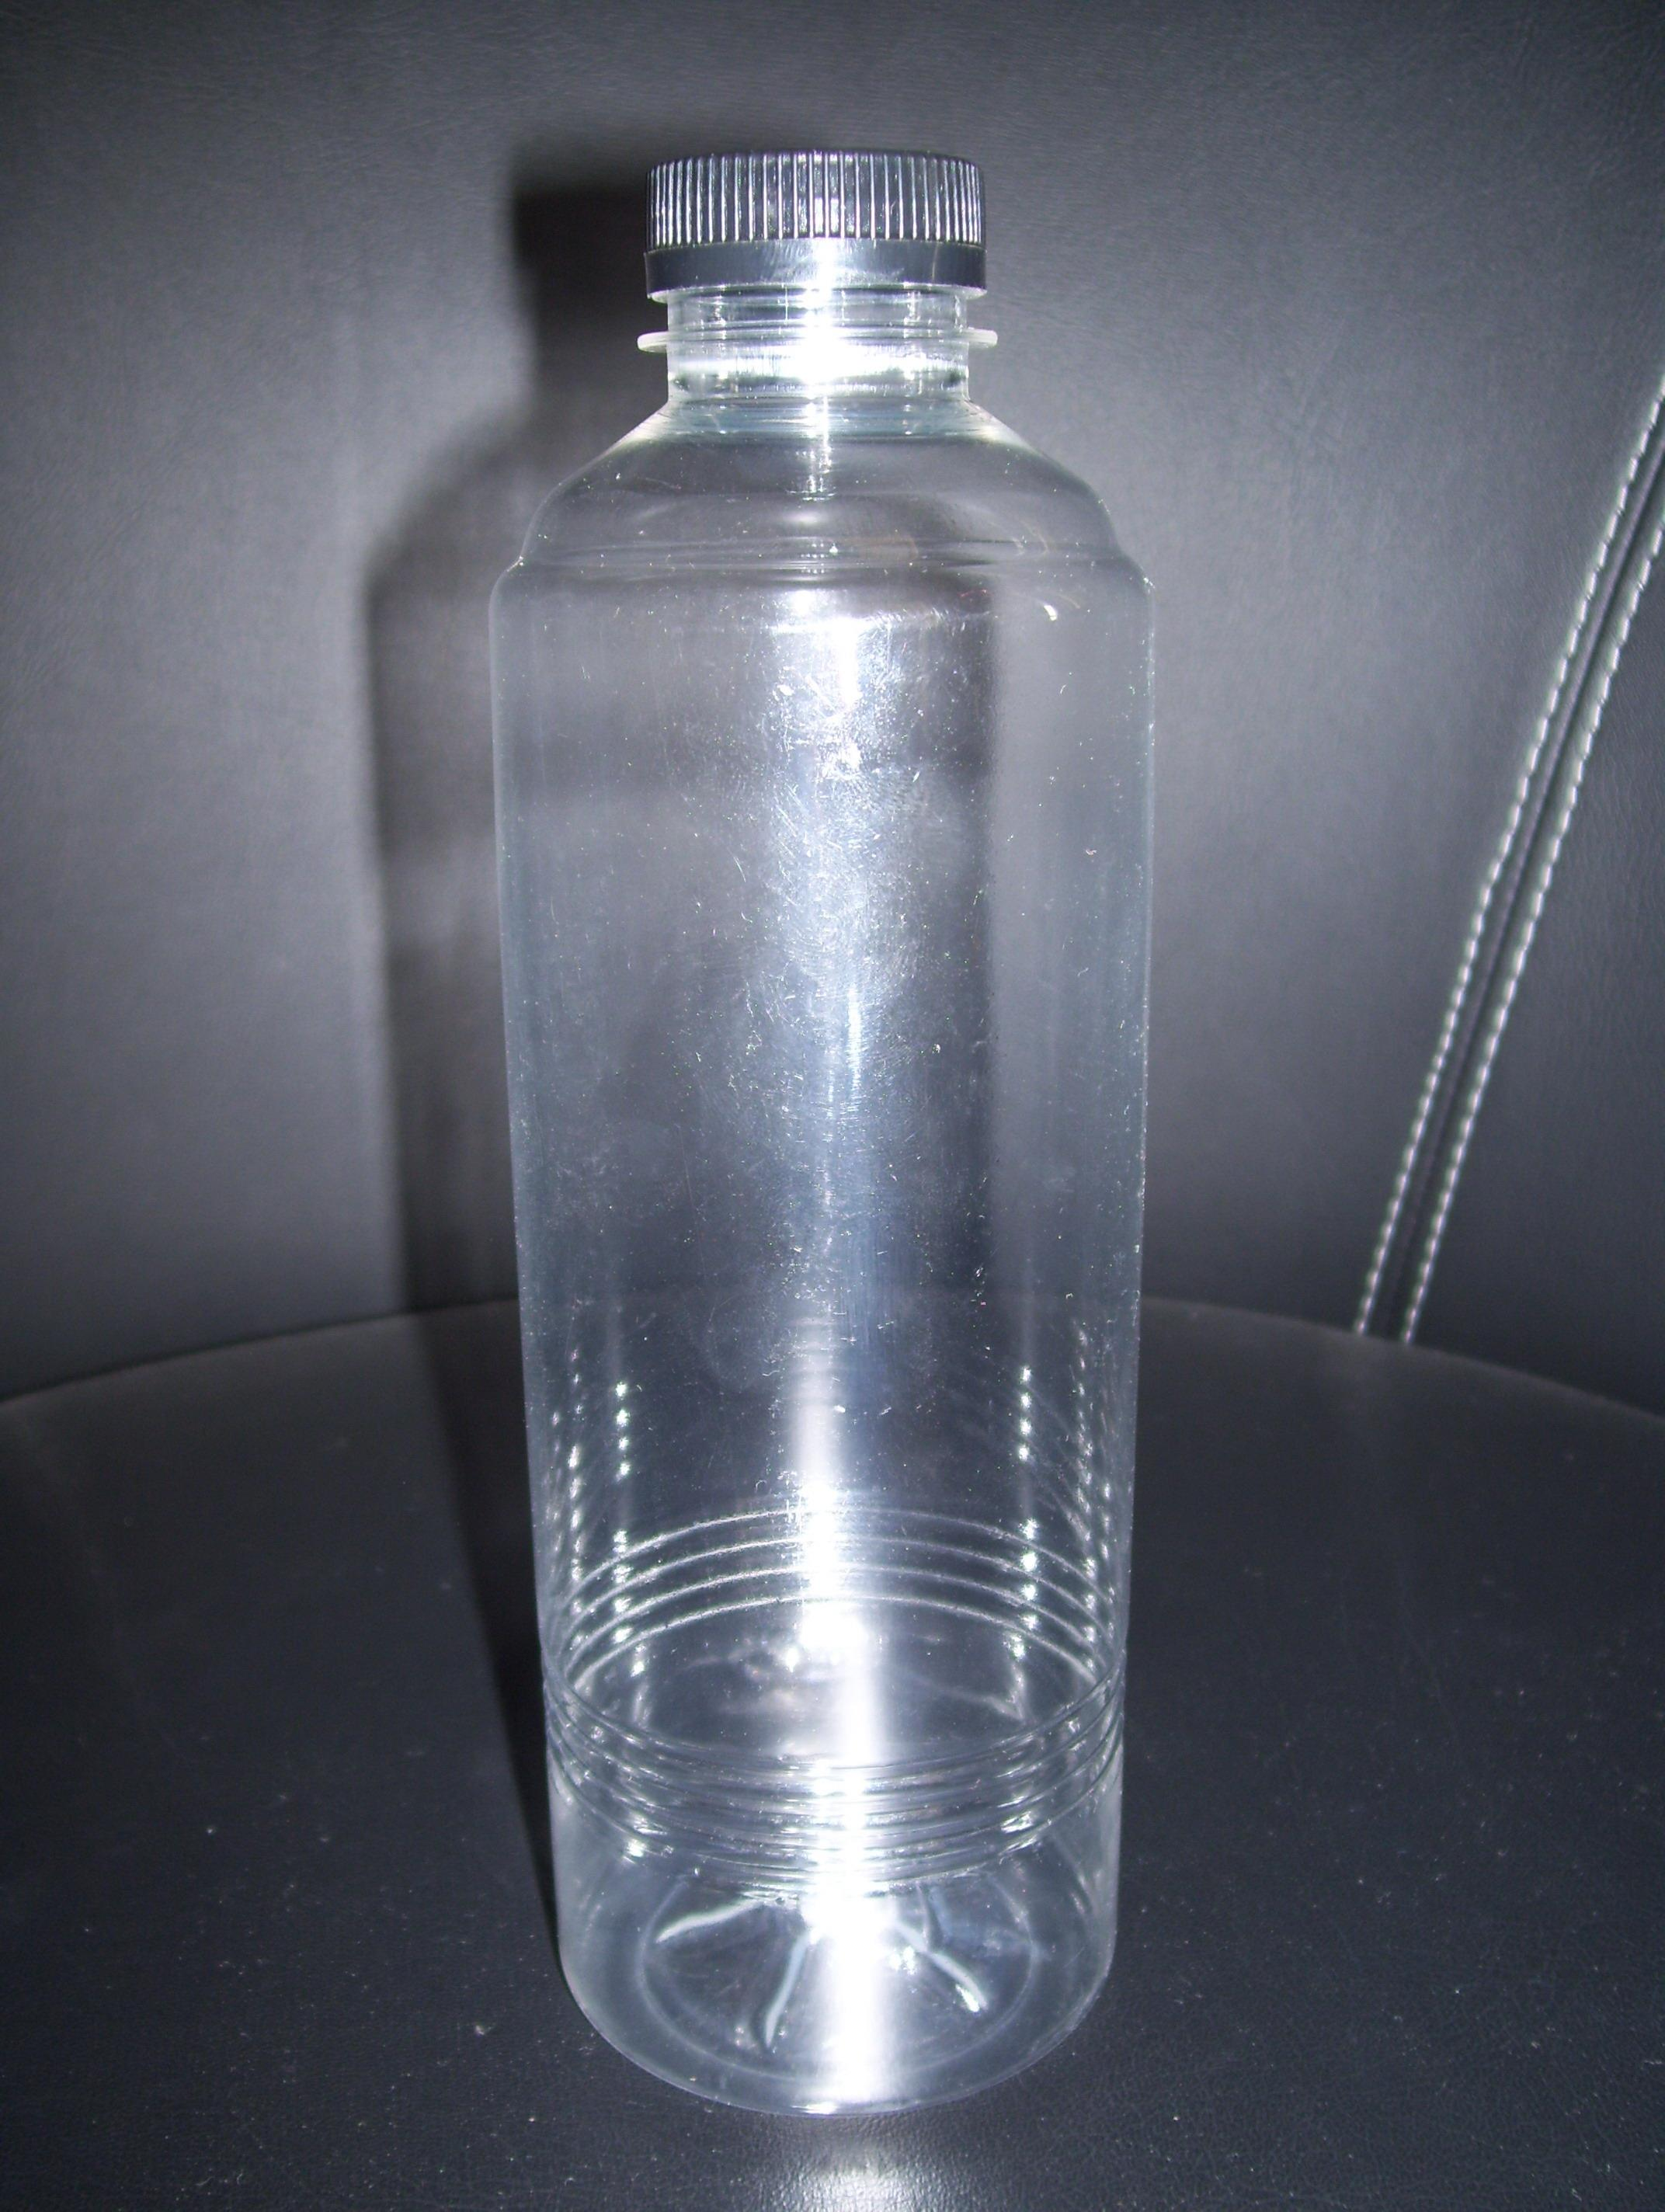 Jual Botol Plastik Distributor Beli Supplier Eksportir 250 Ml Tutup Pump Natural Almond 500ml